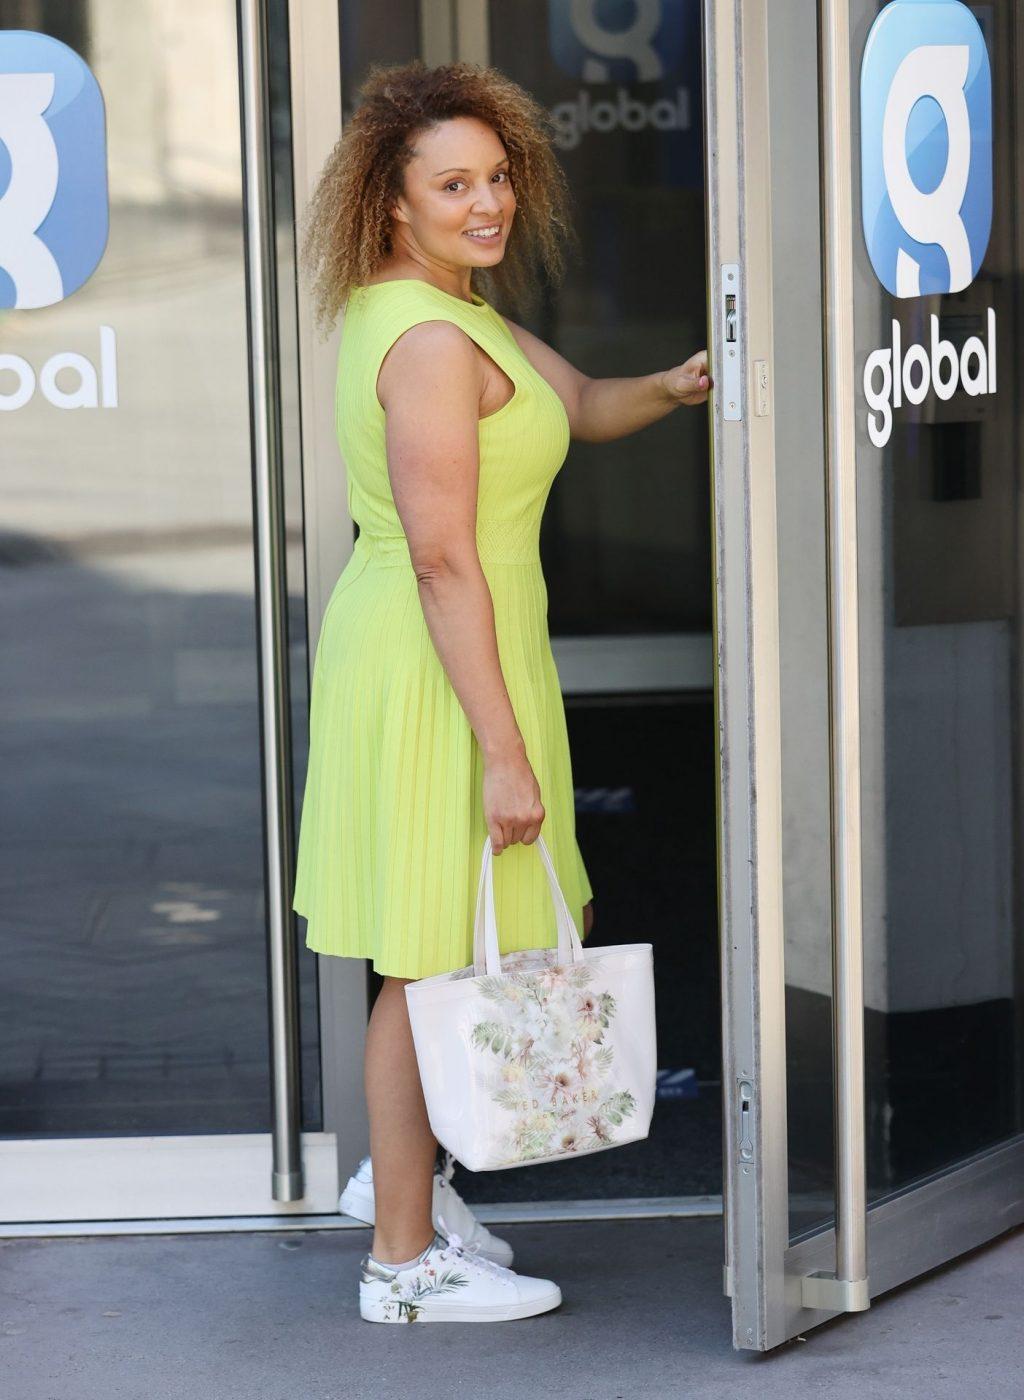 Sexy Pandora Arrives at Heart Radio in London (11 Photos)